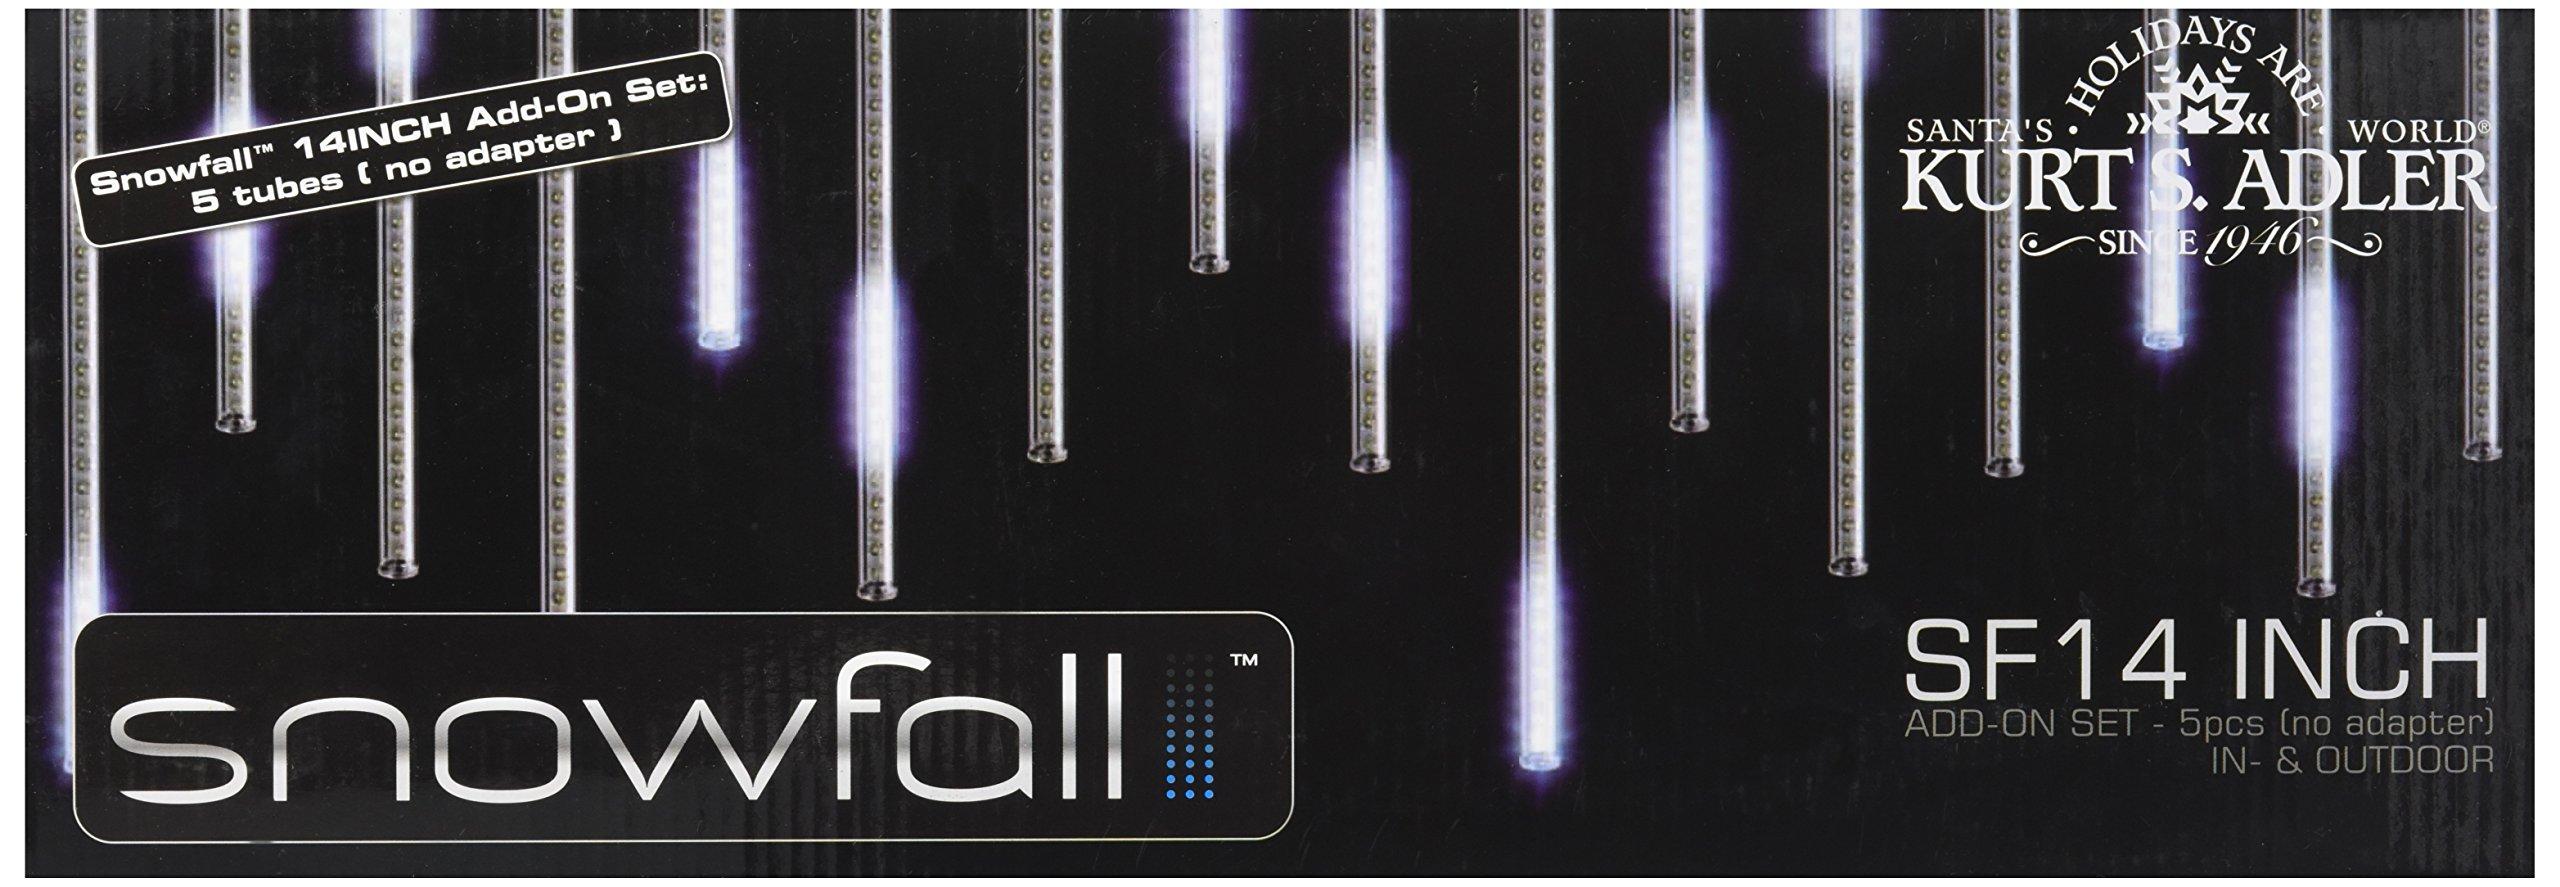 Kurt Adler UL2517N Snowfall Add-On 5-Light Set with 14-Inch Tubes